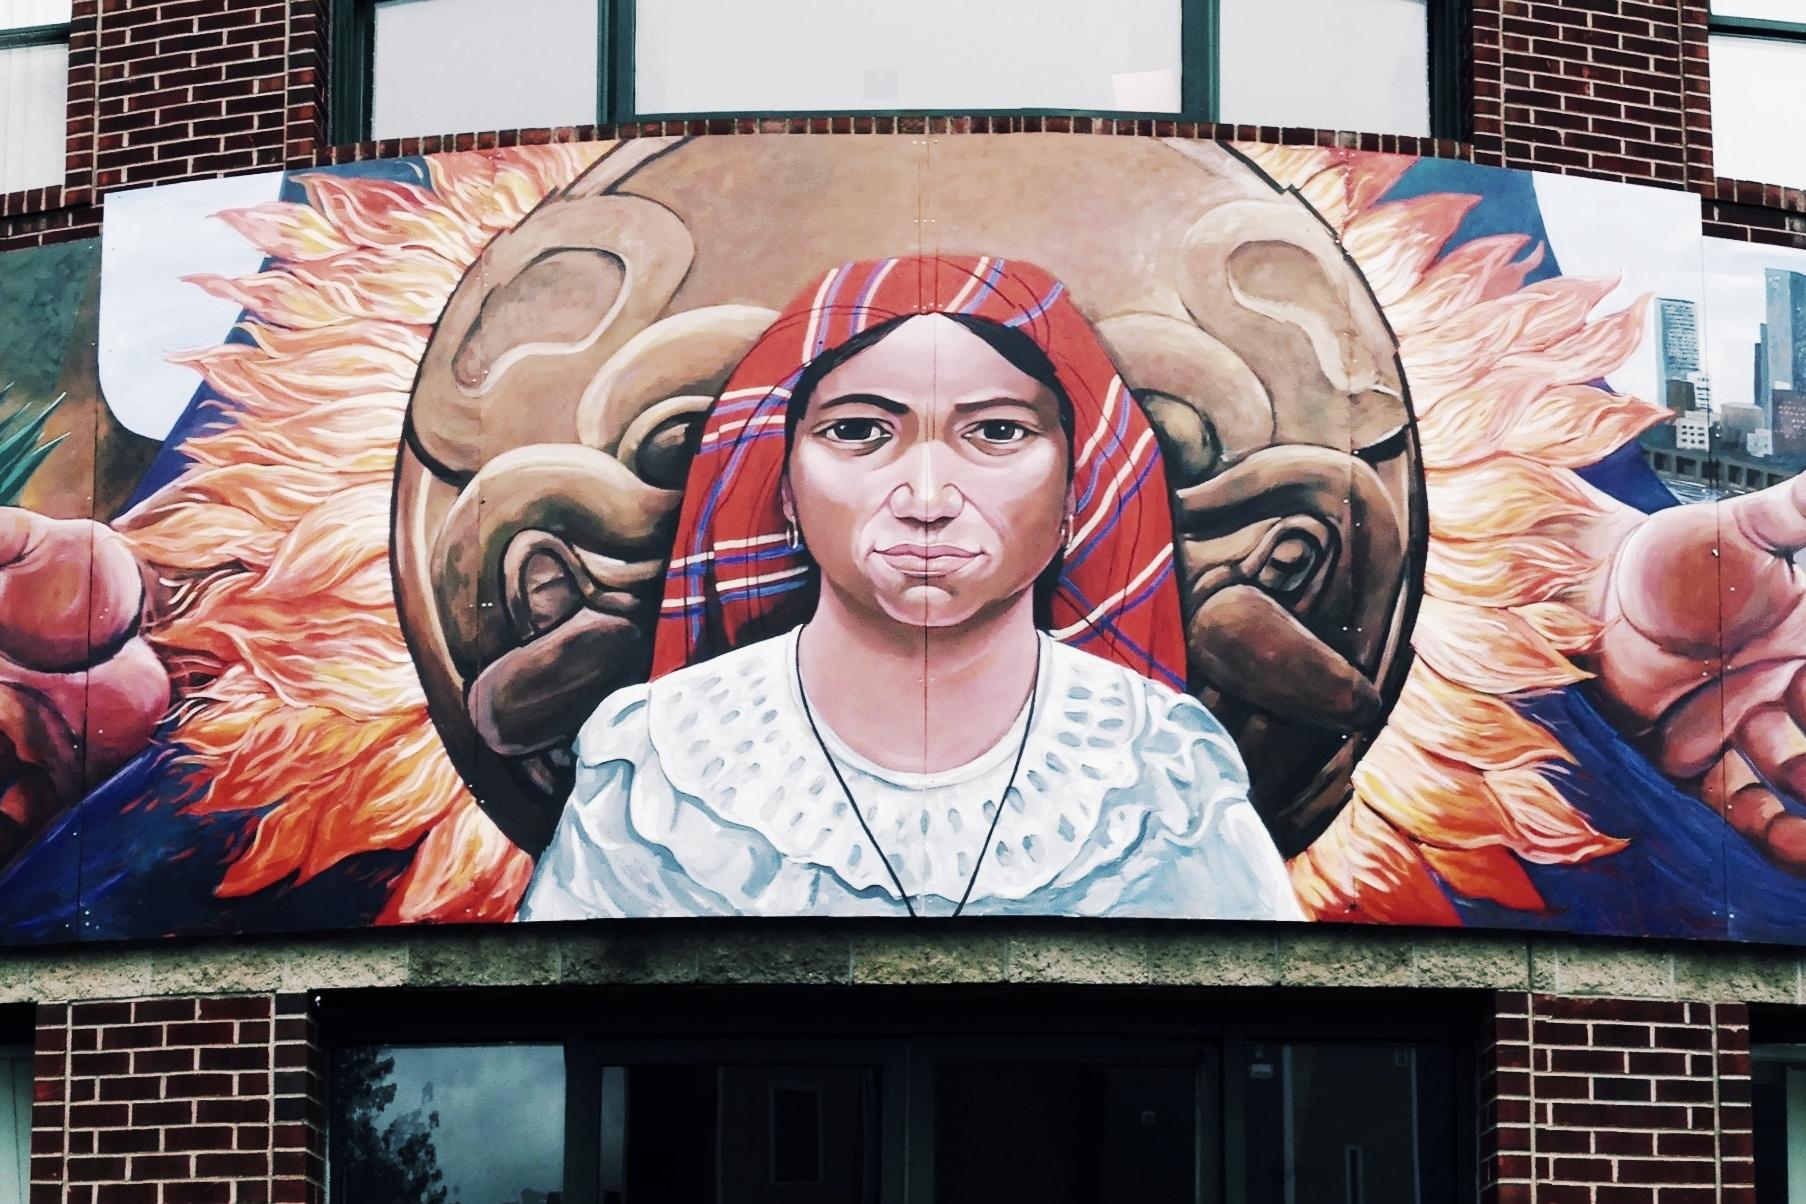 East Boston, Massachusetts, USA - Sharon Granados Mahato